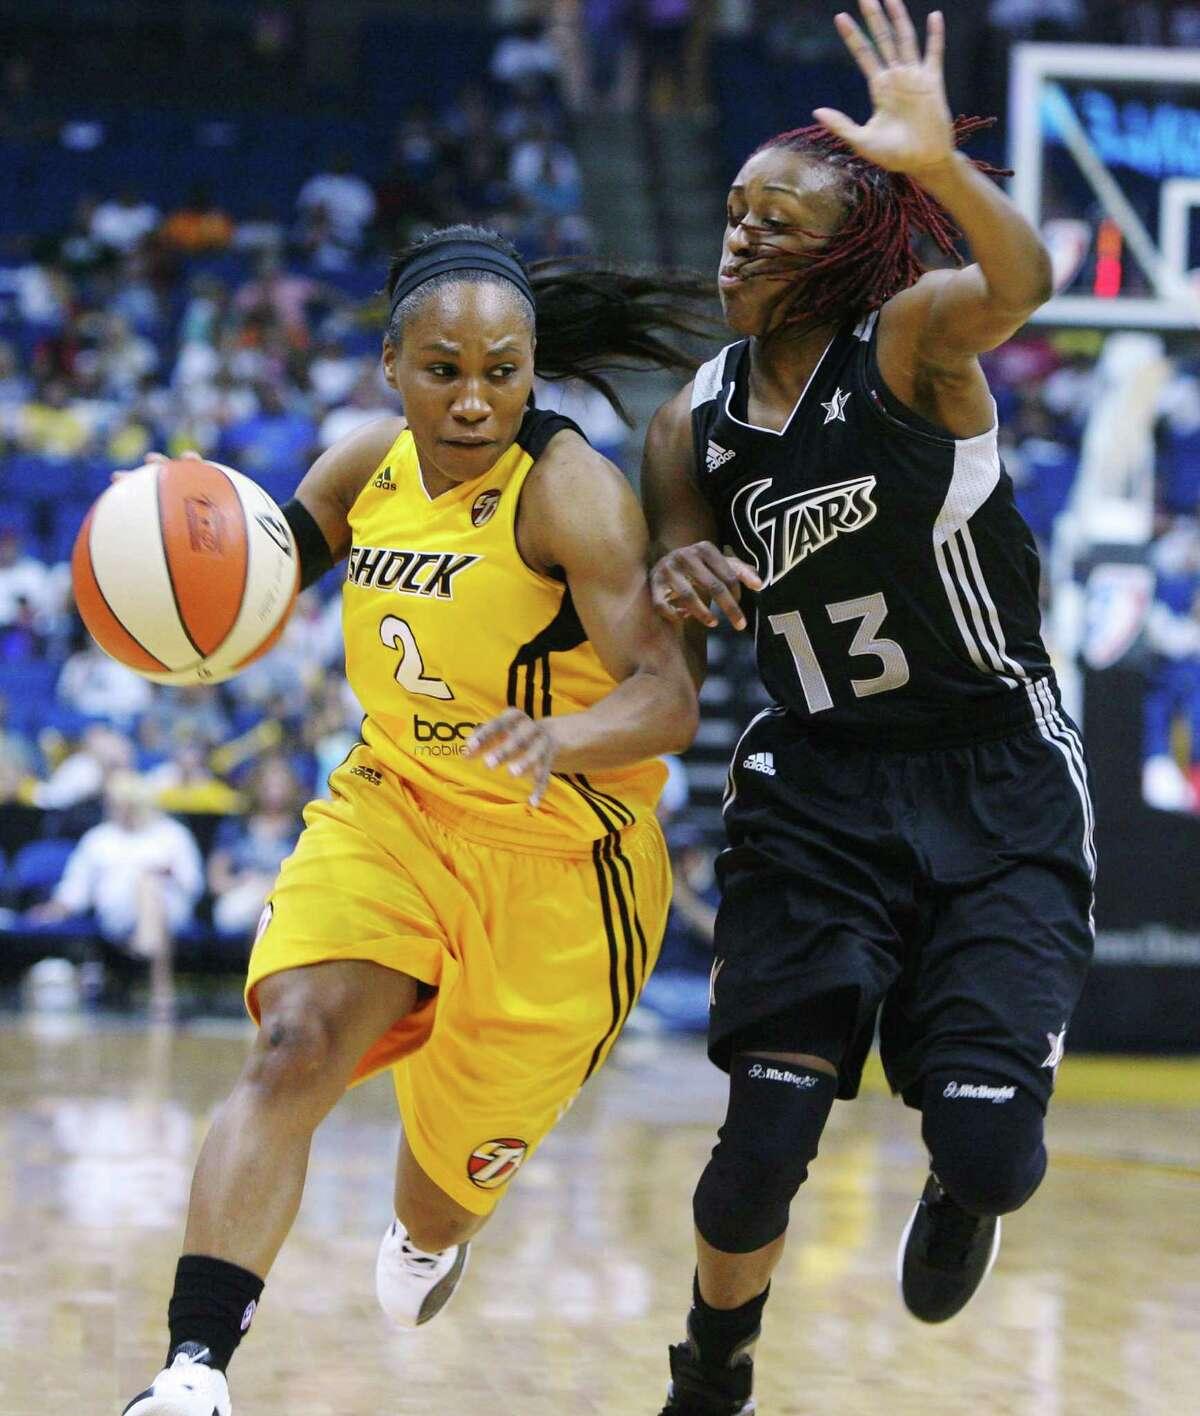 Tulsa Shock's Temeka Johnson tries to get around San Antonio Silver Stars' Danielle Robinson during a WNBA basketball game Saturday, May 19, 2012, in Tulsa, Okla. (AP Photo/Tulsa World, James Gibbard) ONLINE OUT TV OUT TULSA OUT